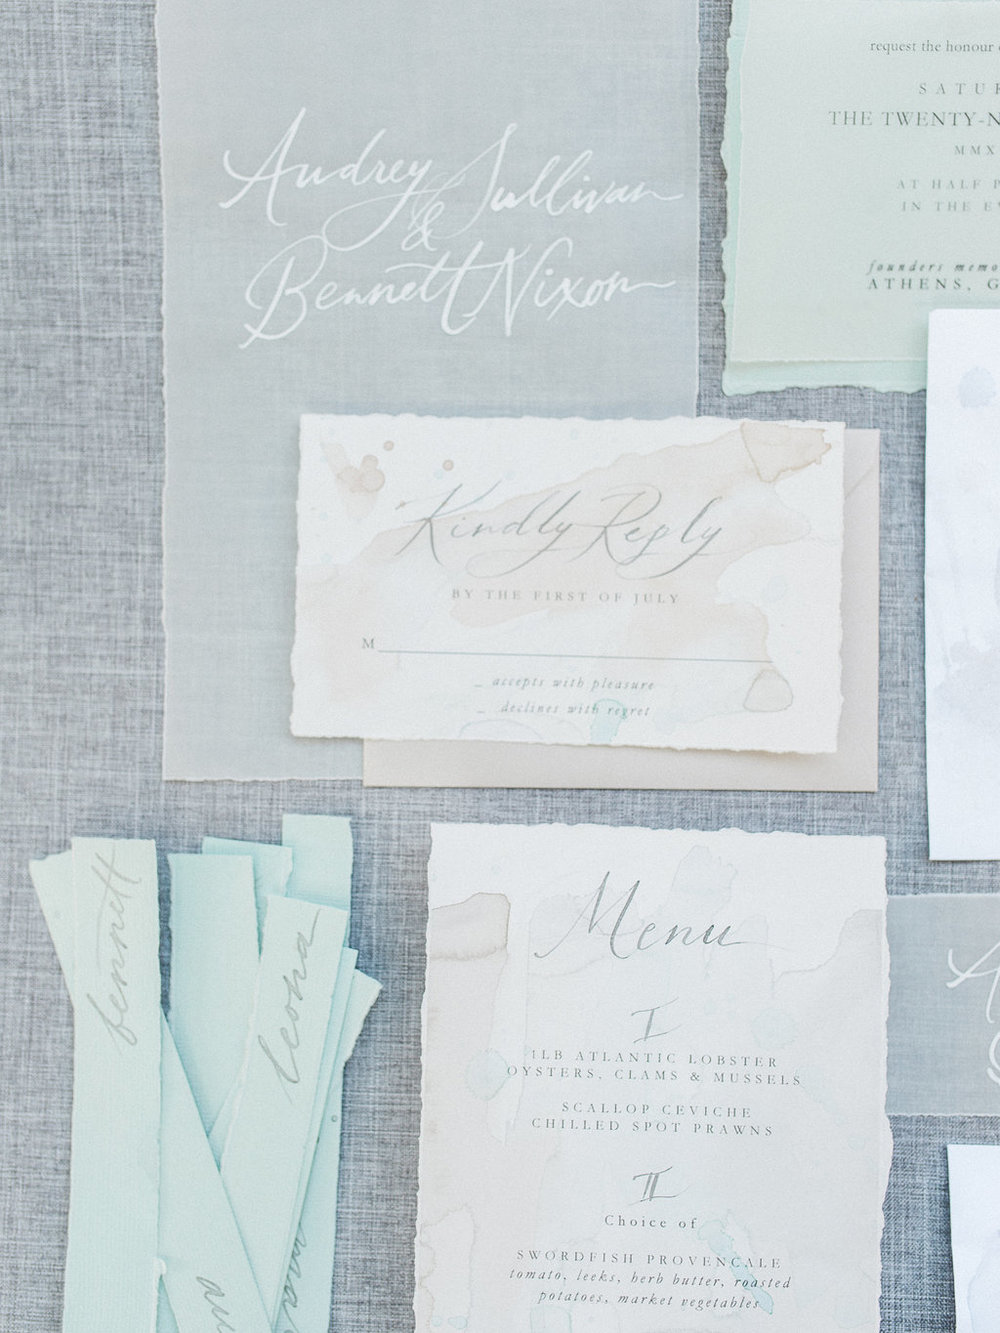 athens-founders-memorial-garden-wedding-photography-hannah-forsberg-atlanta-wedding-photographer-6.jpg